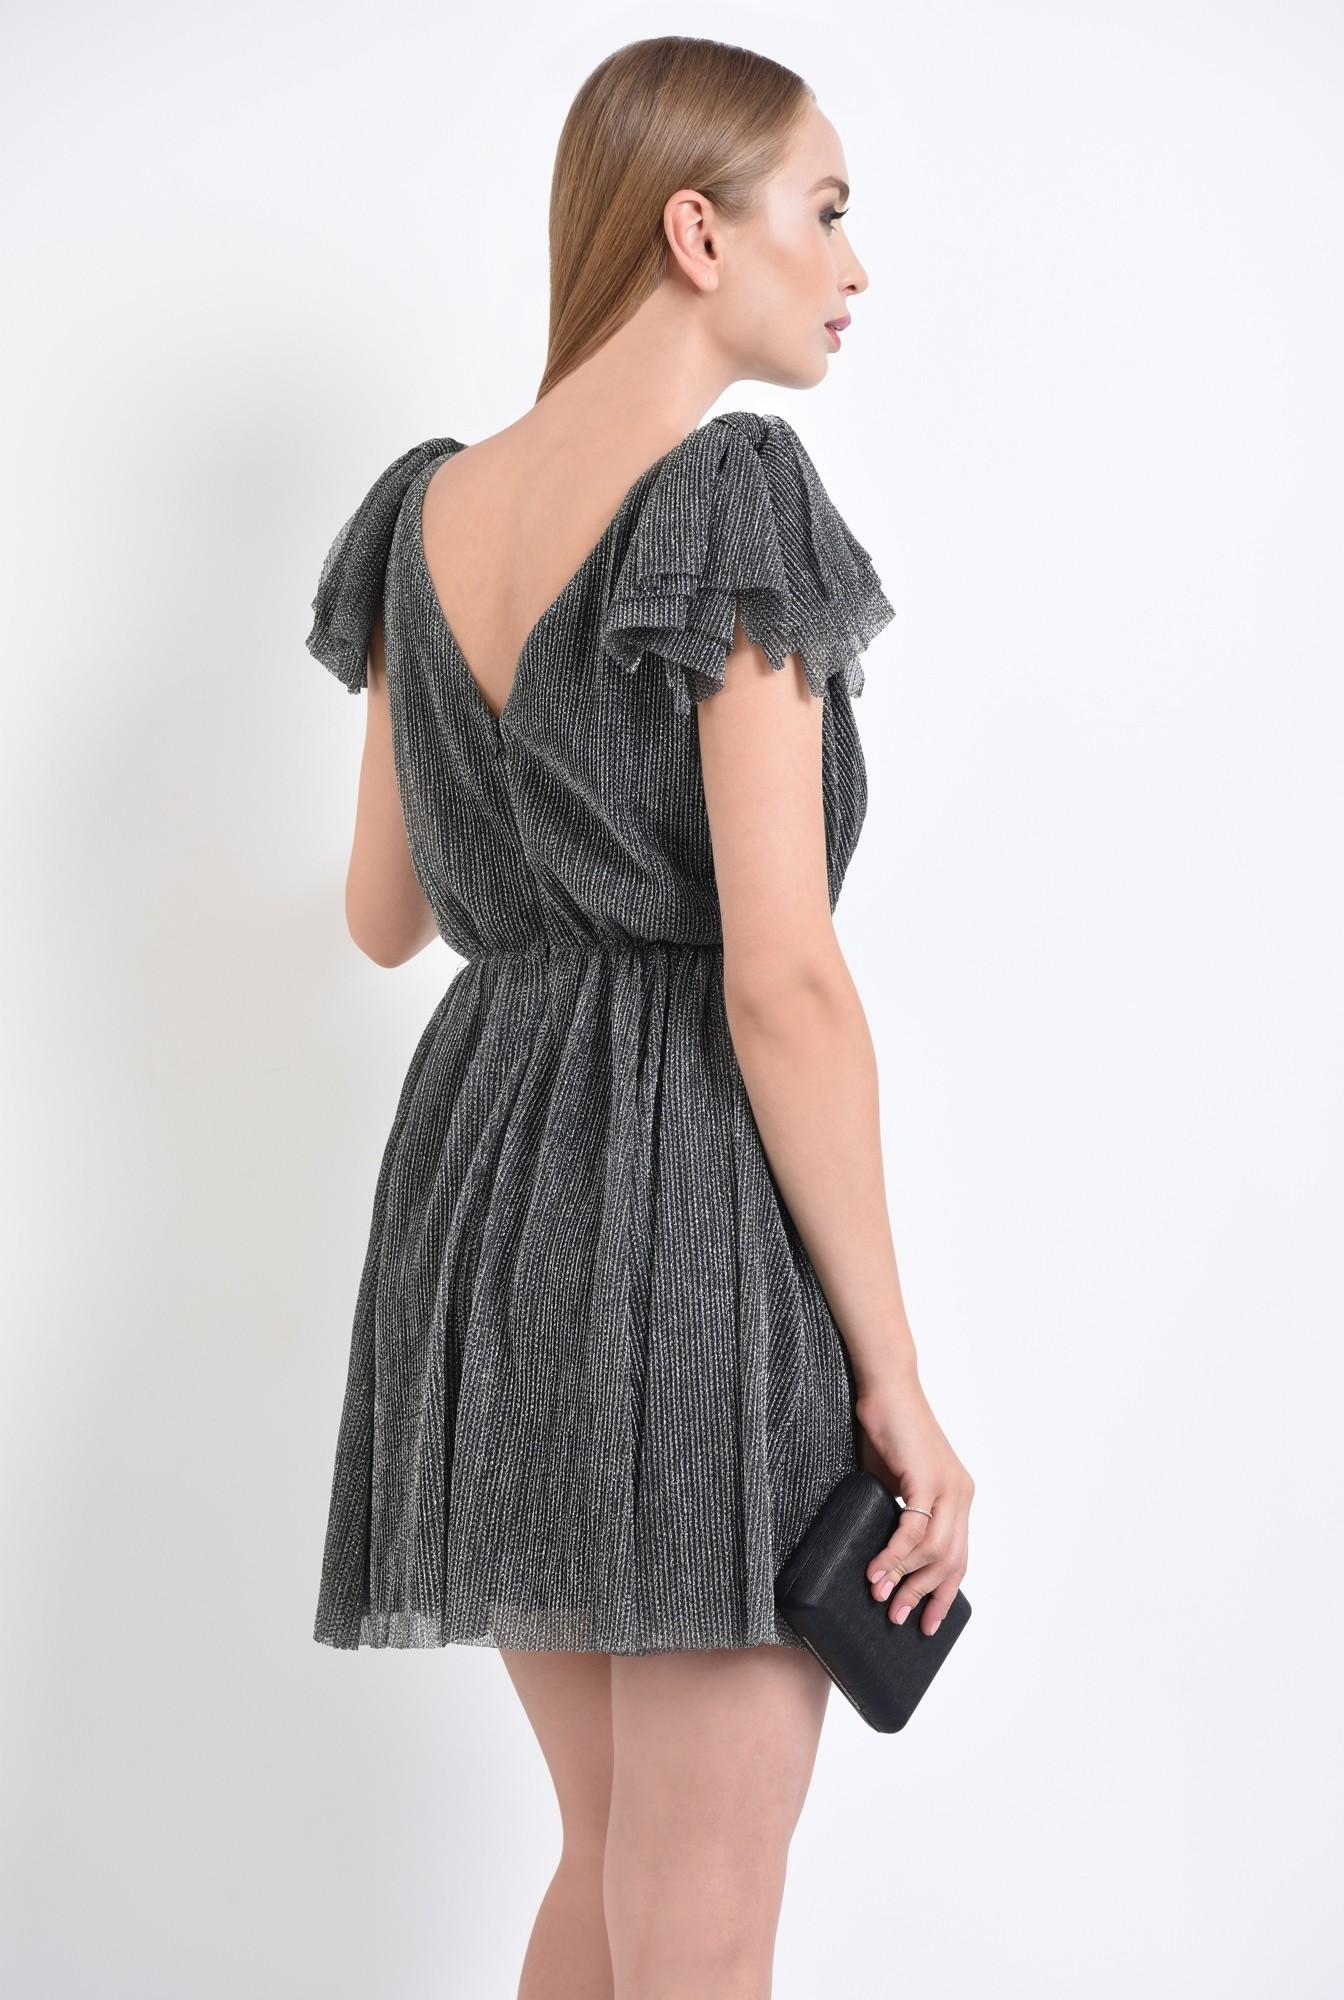 1 - rochie de ocazie, argintiu, negru, lurex, funde